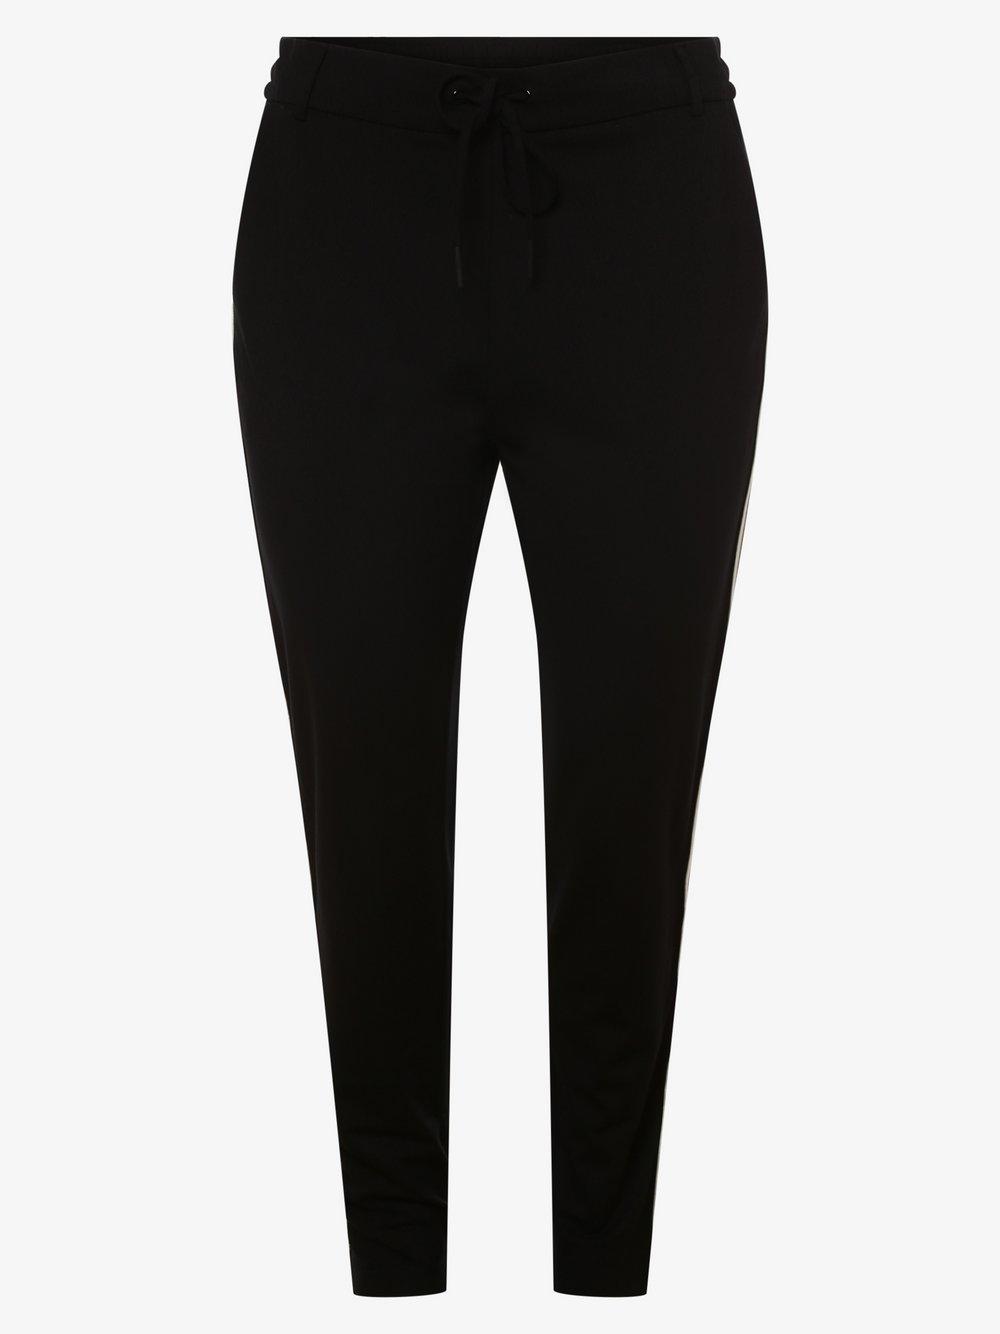 ONLY Carmakoma – Spodnie damskie – Cargoldtrash, czarny Van Graaf 476885-0001